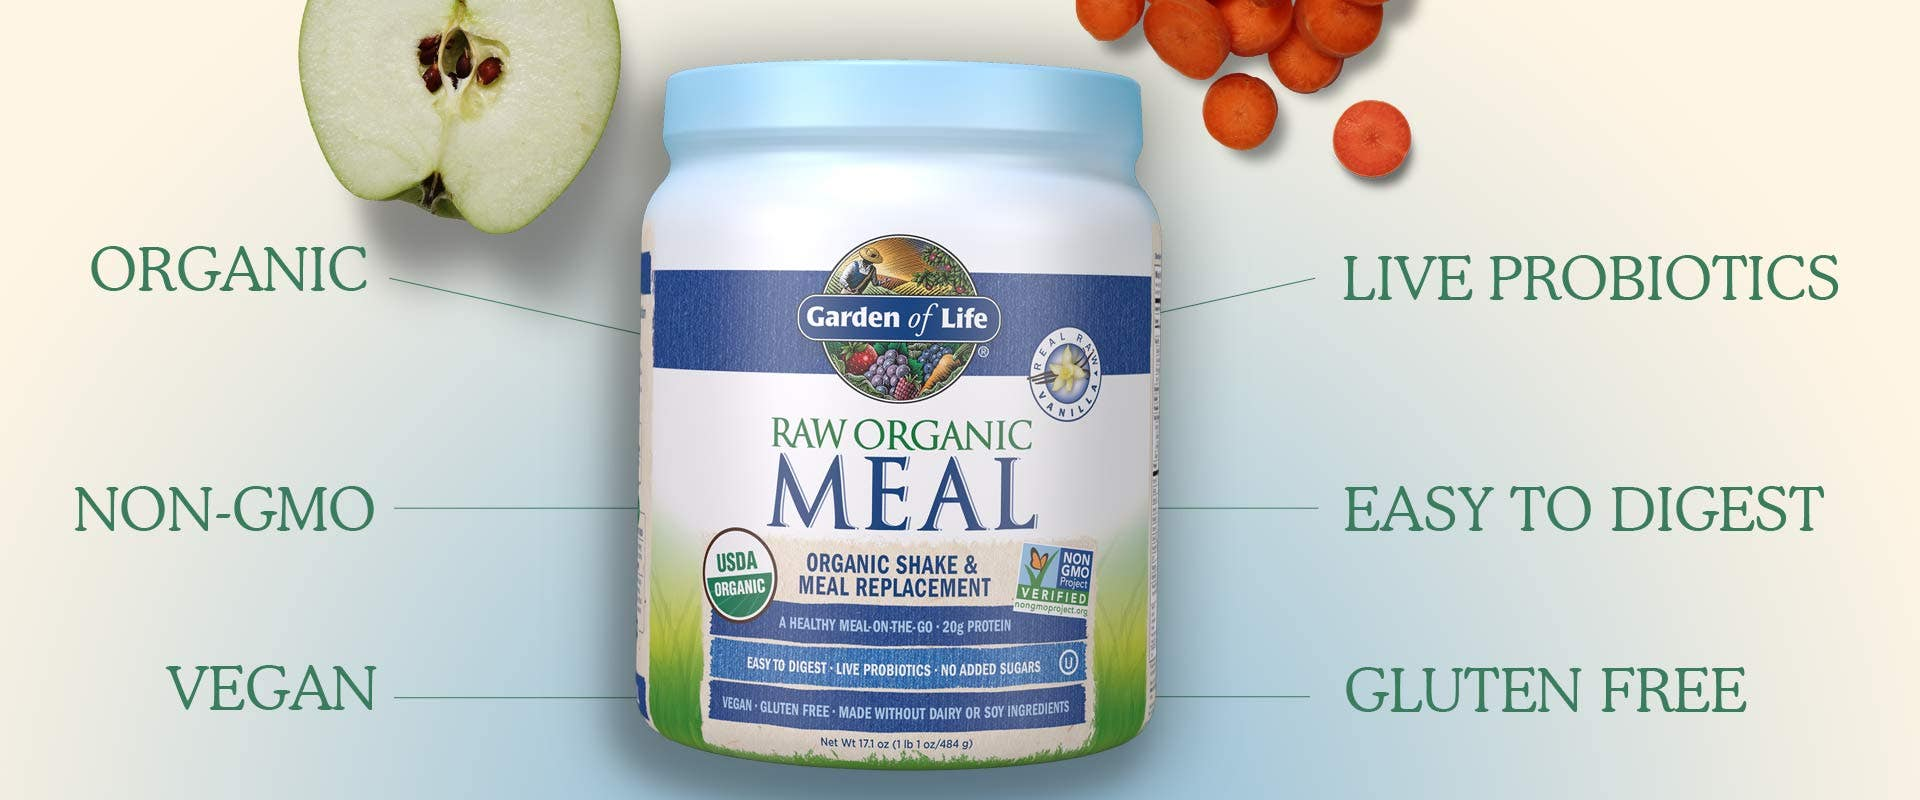 Garedn of Life Raw Organic Meal Vanilla